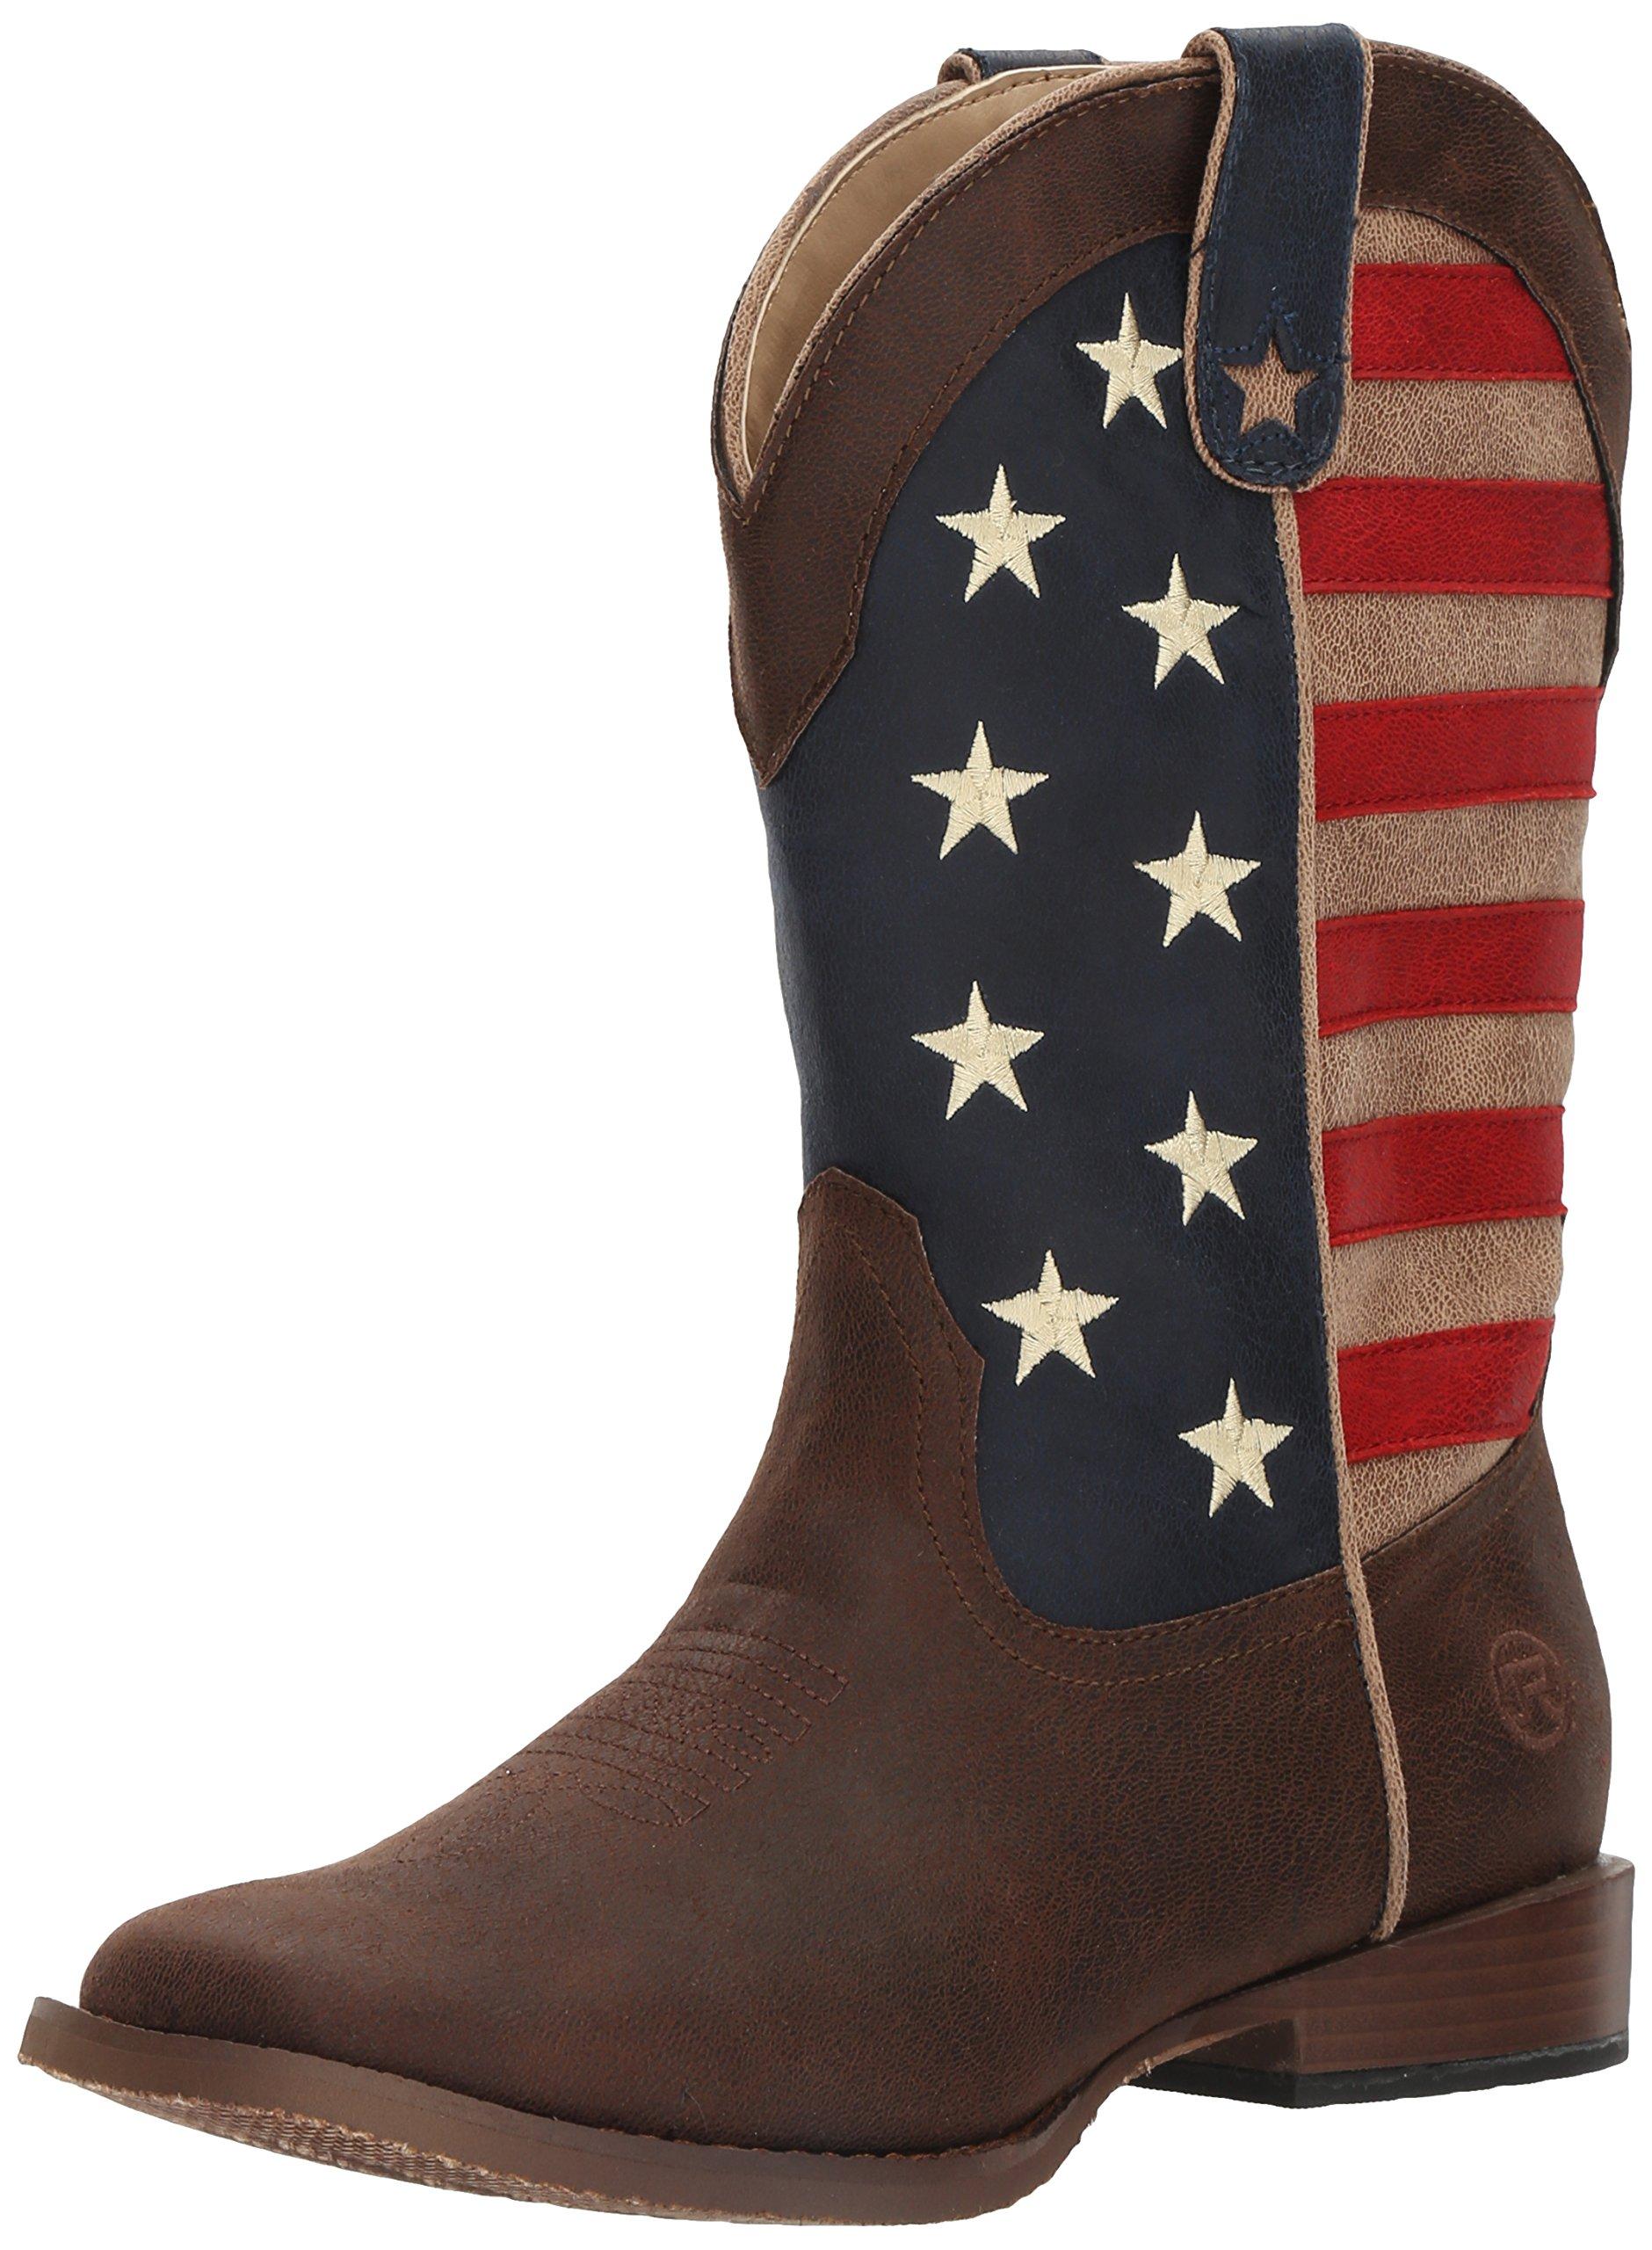 Roper Boys' American Patriot, Brown, 4 M US Big Kid